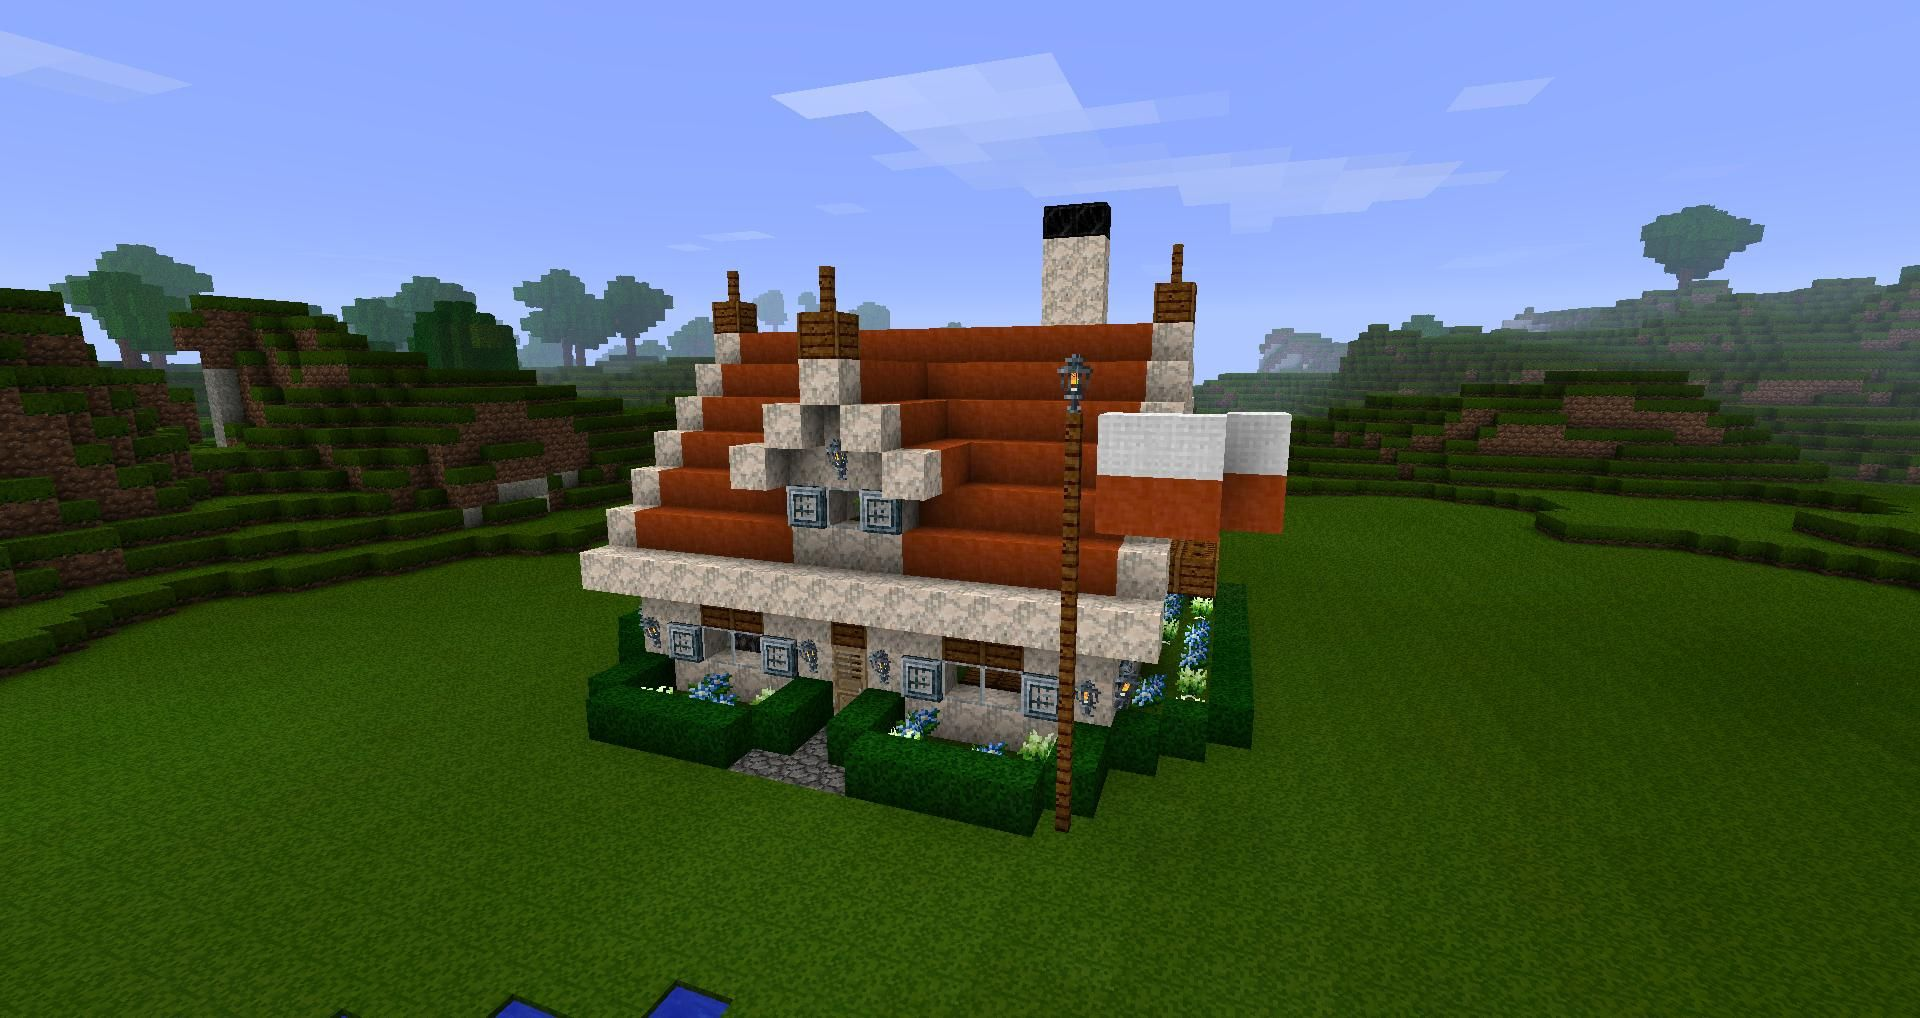 fc128ae5b5d965f9f8d757fada6df6b1 - 24+ Small Cute Cottage Small Cute Minecraft House Ideas Pics